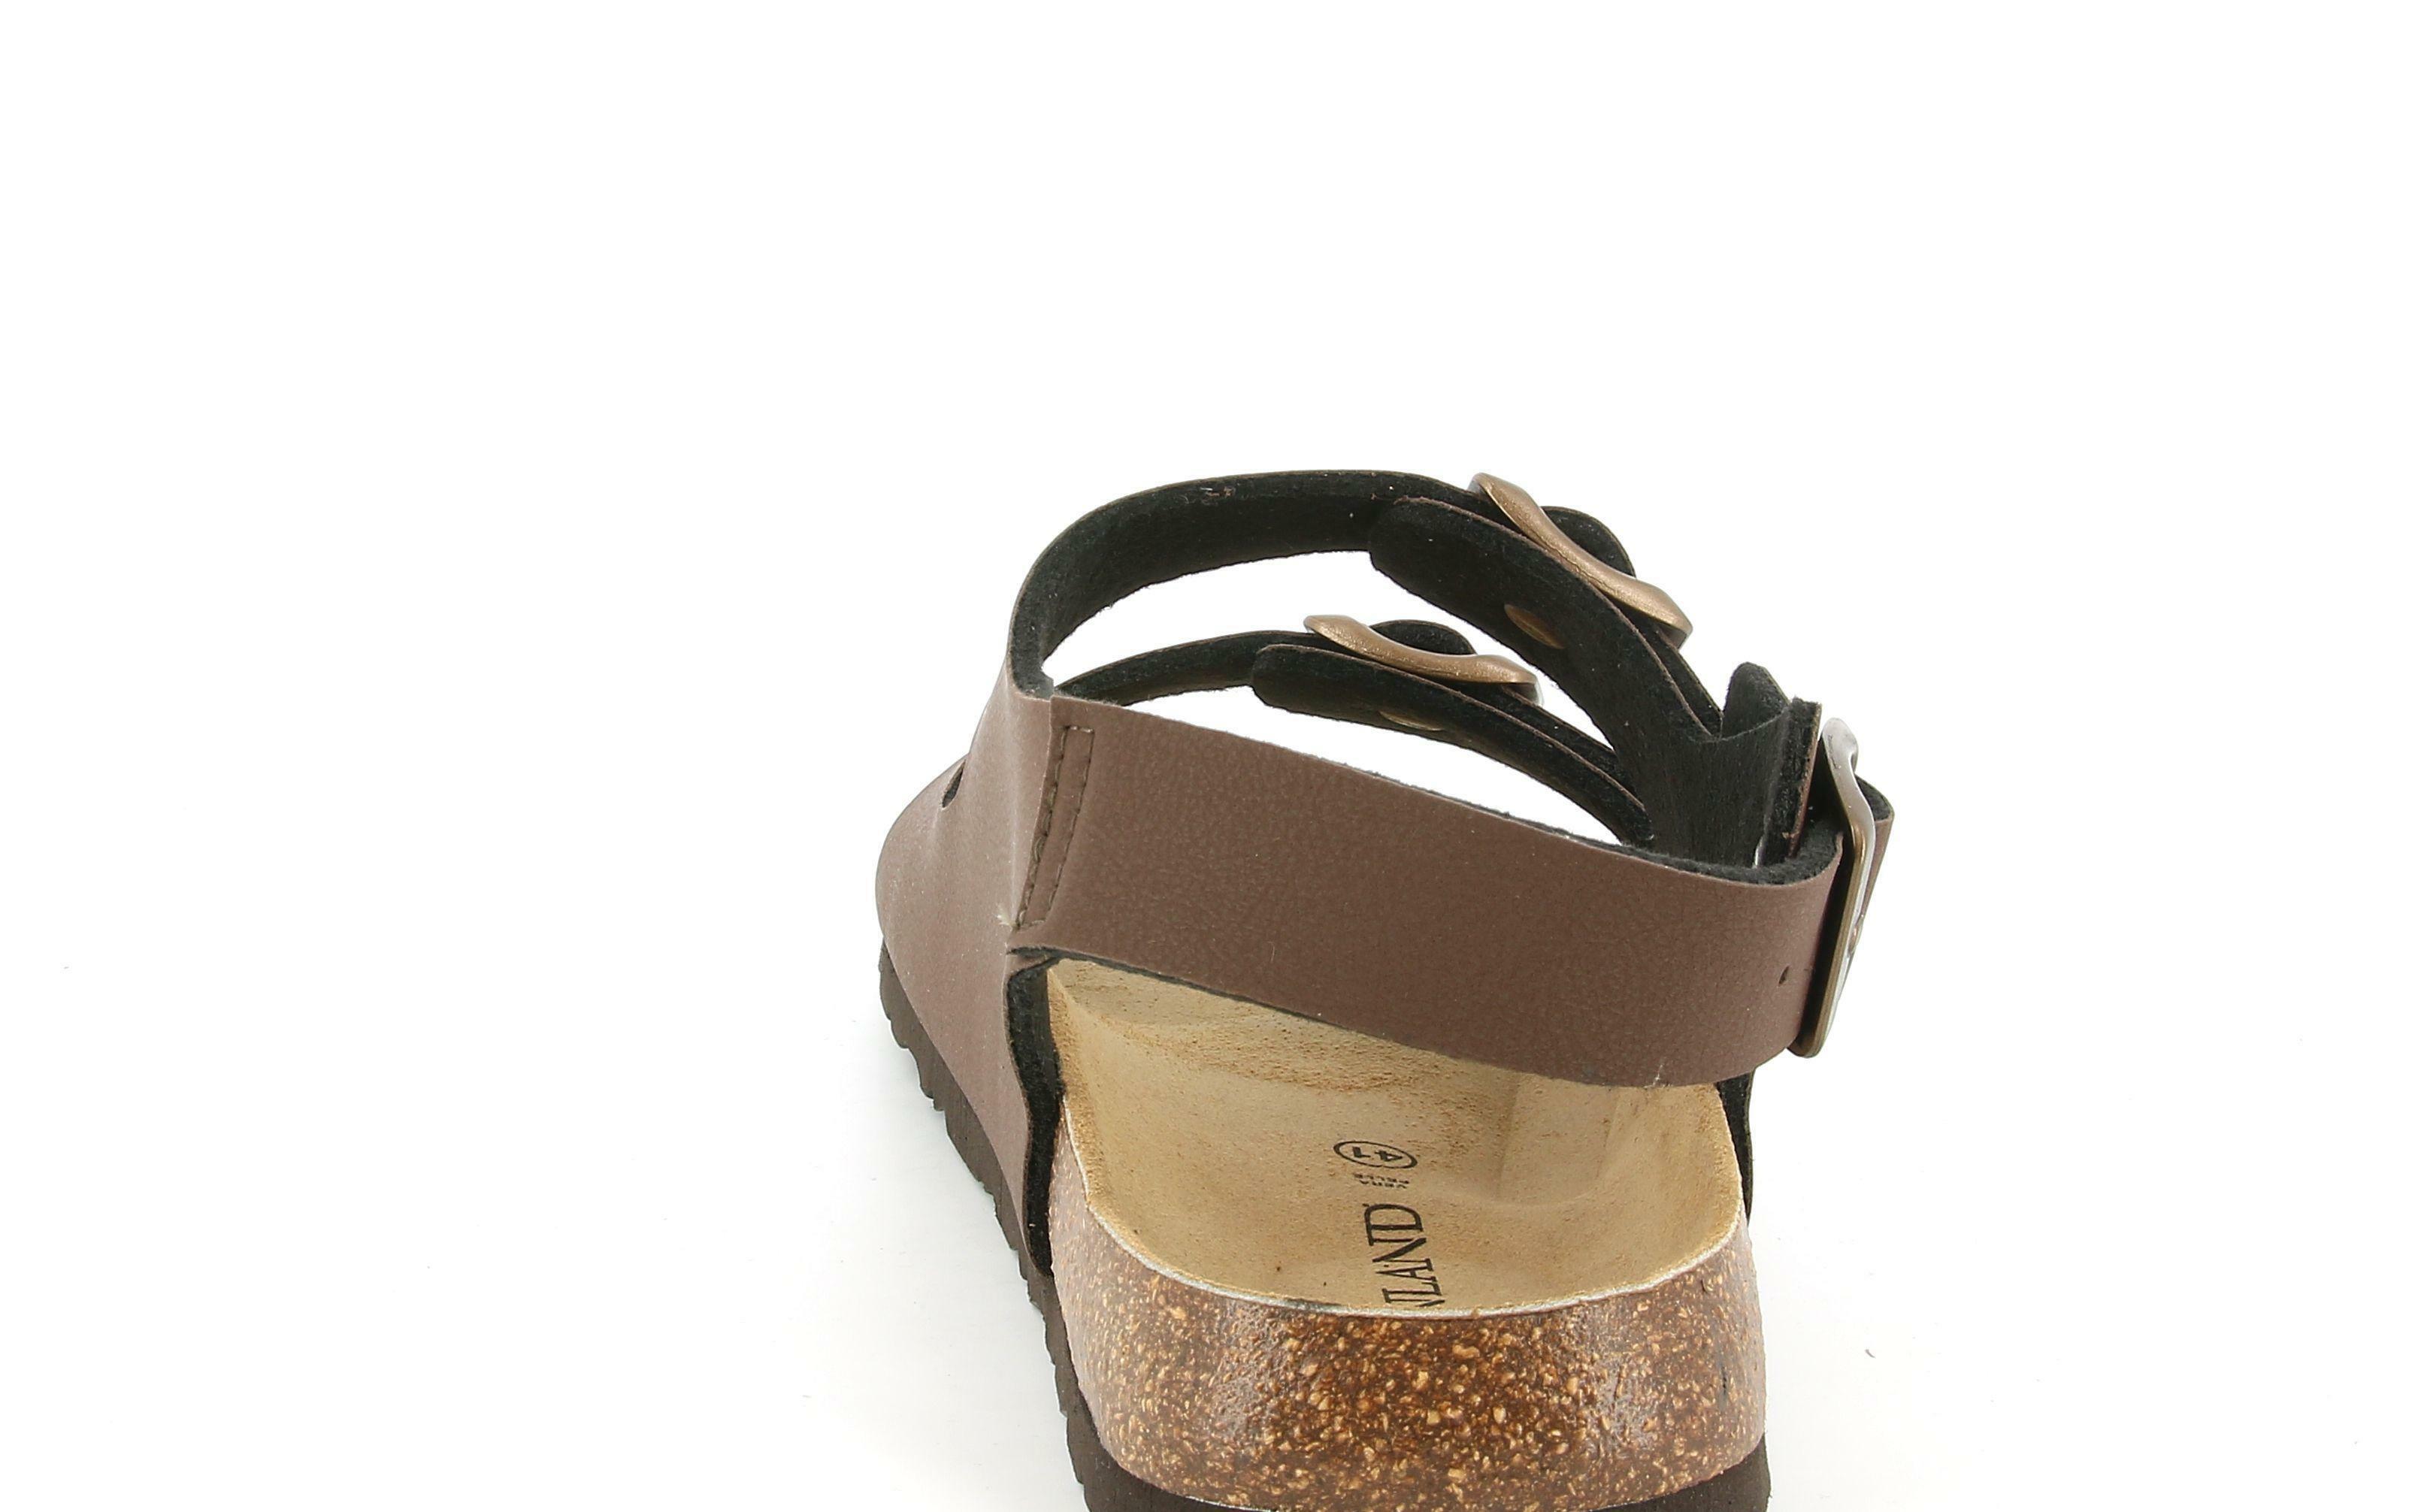 grunland grunland sb3645 40bobo sandalo da uomo mogano